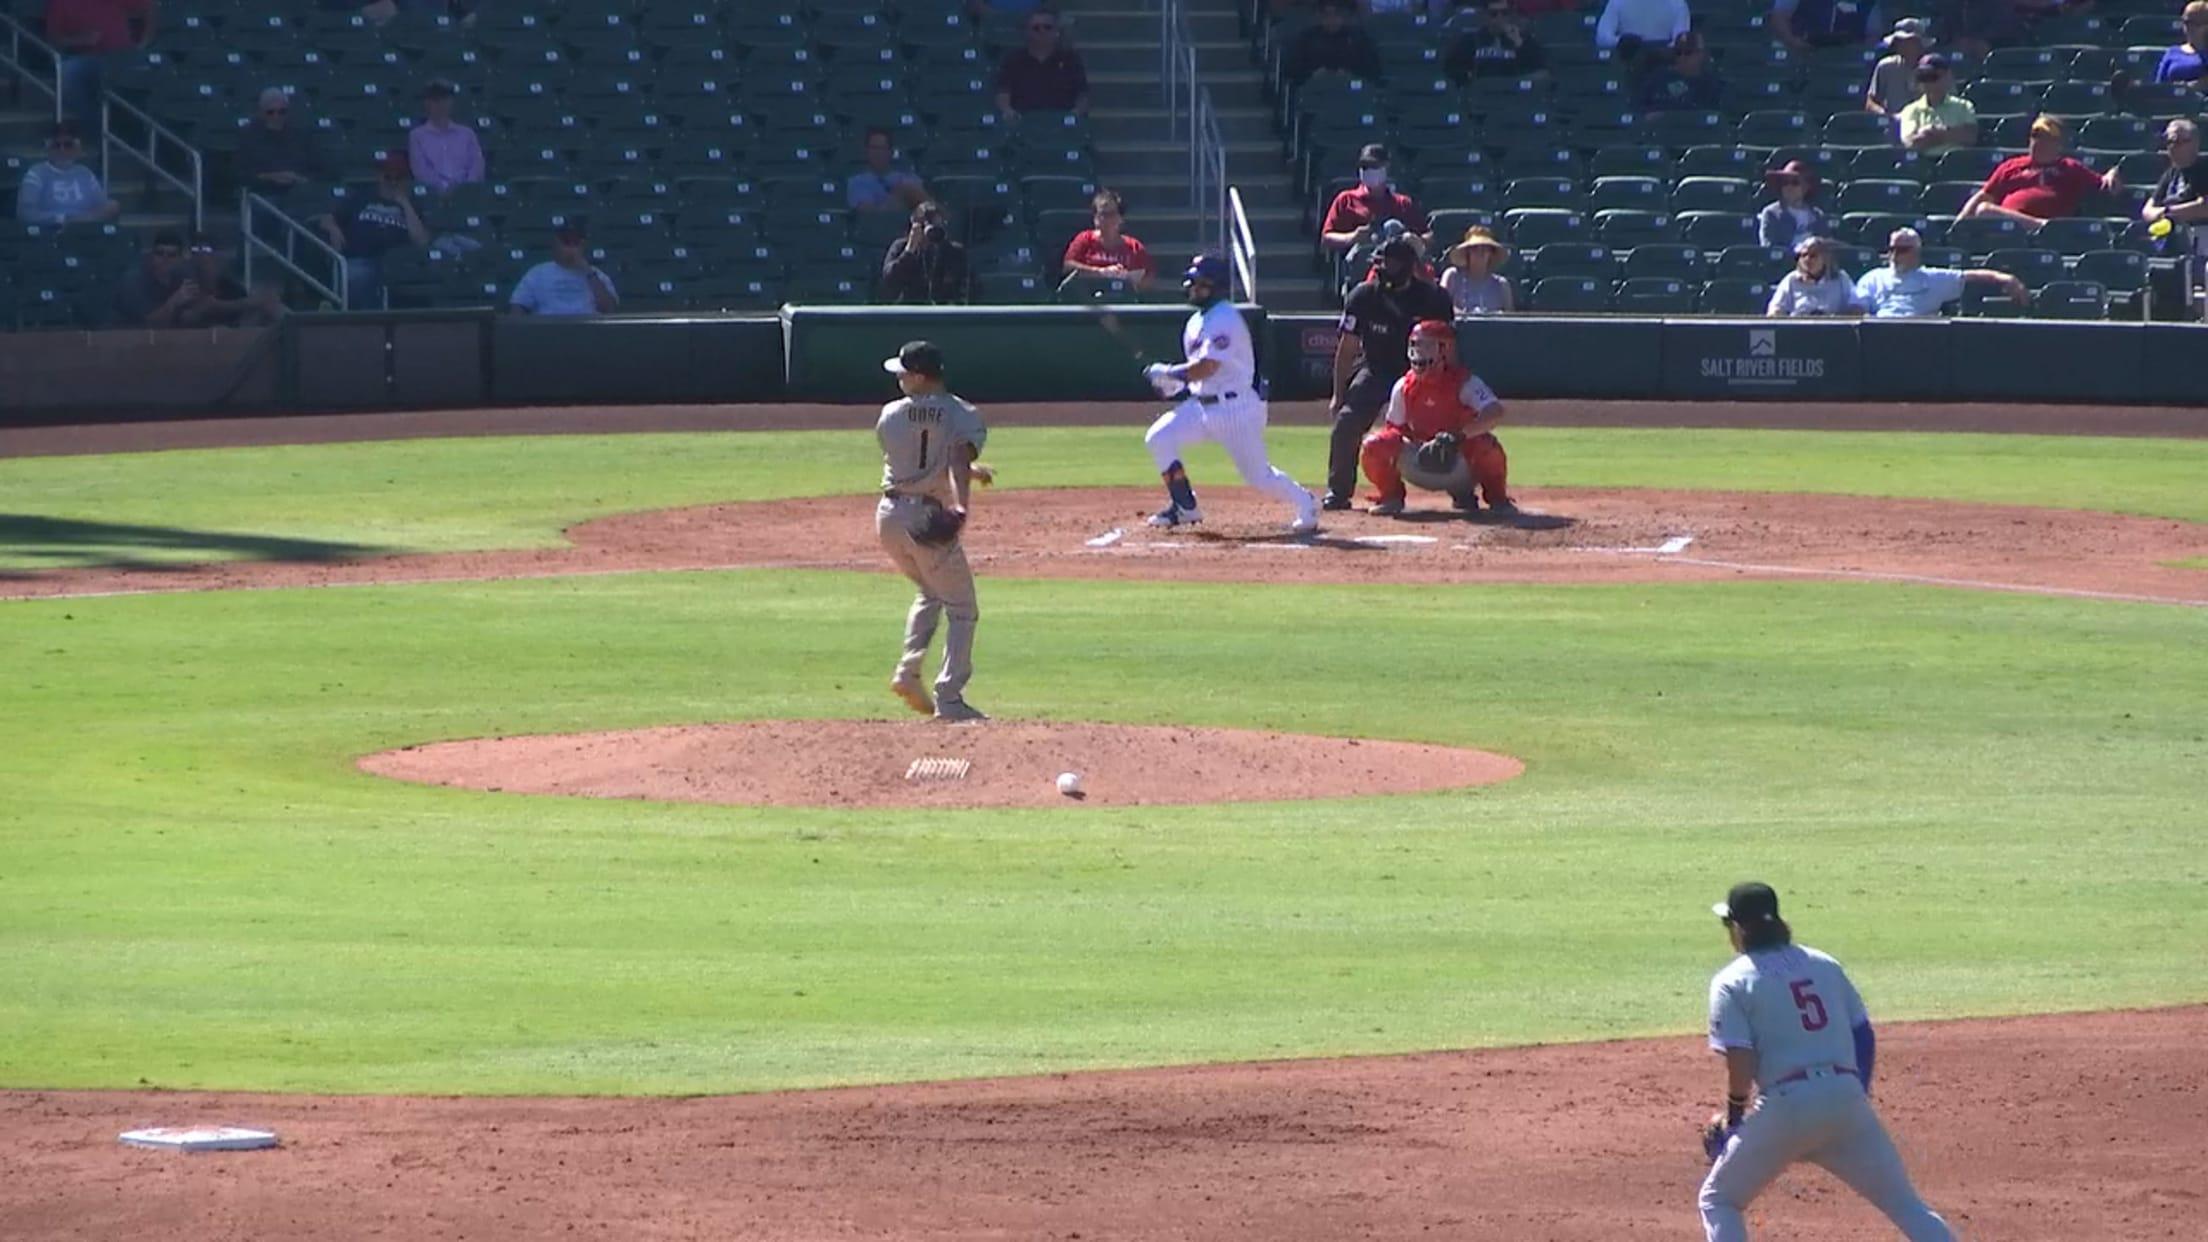 Carlos Cortes' three-hit game